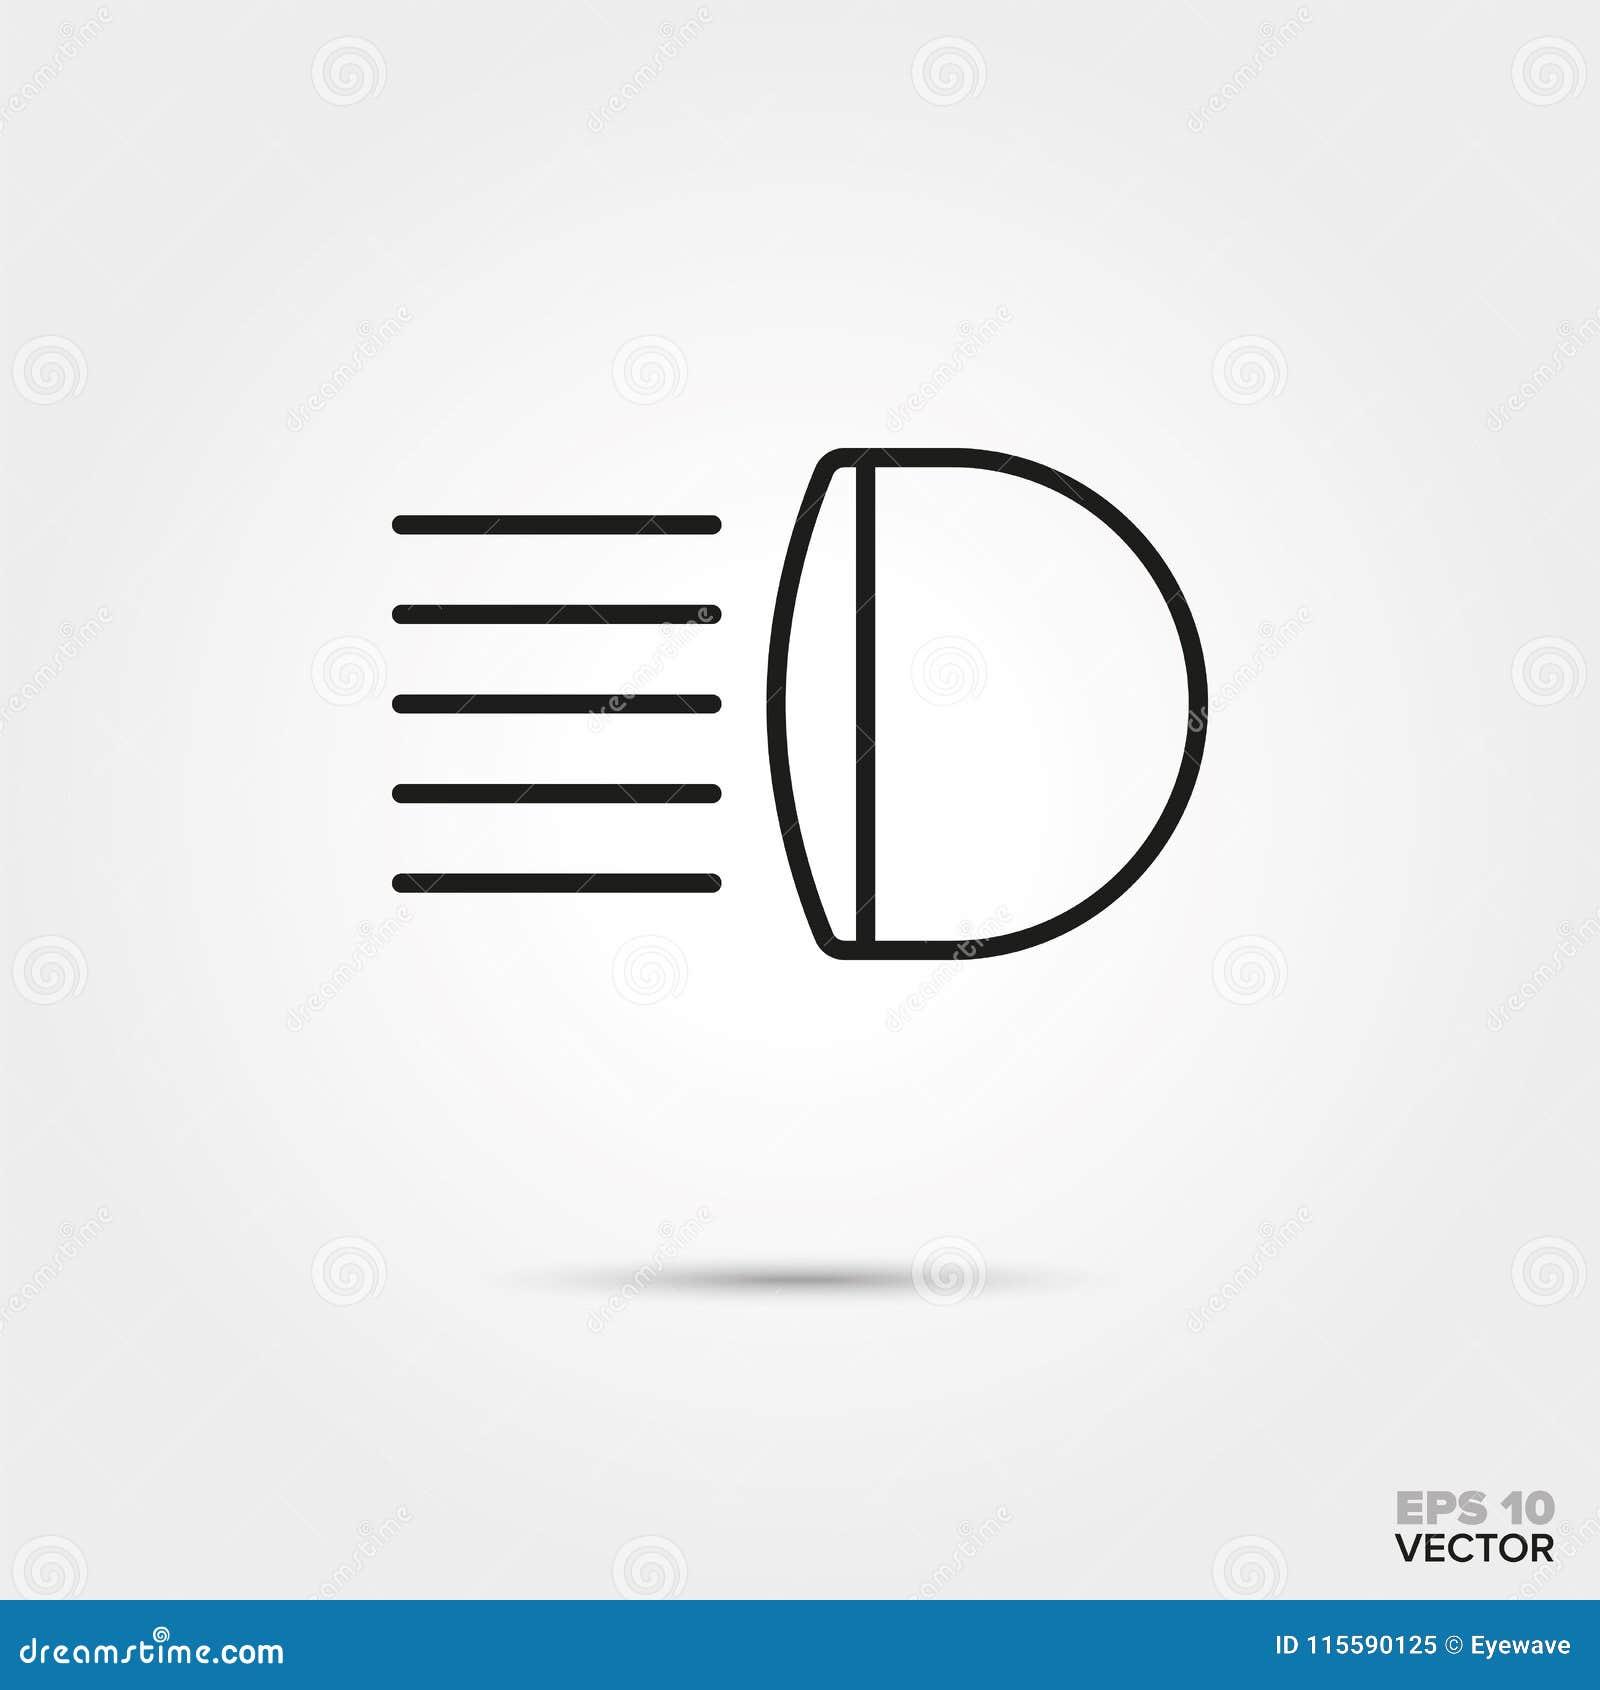 Car Headlight Vector Icon Stock Vector Illustration Of Automobile